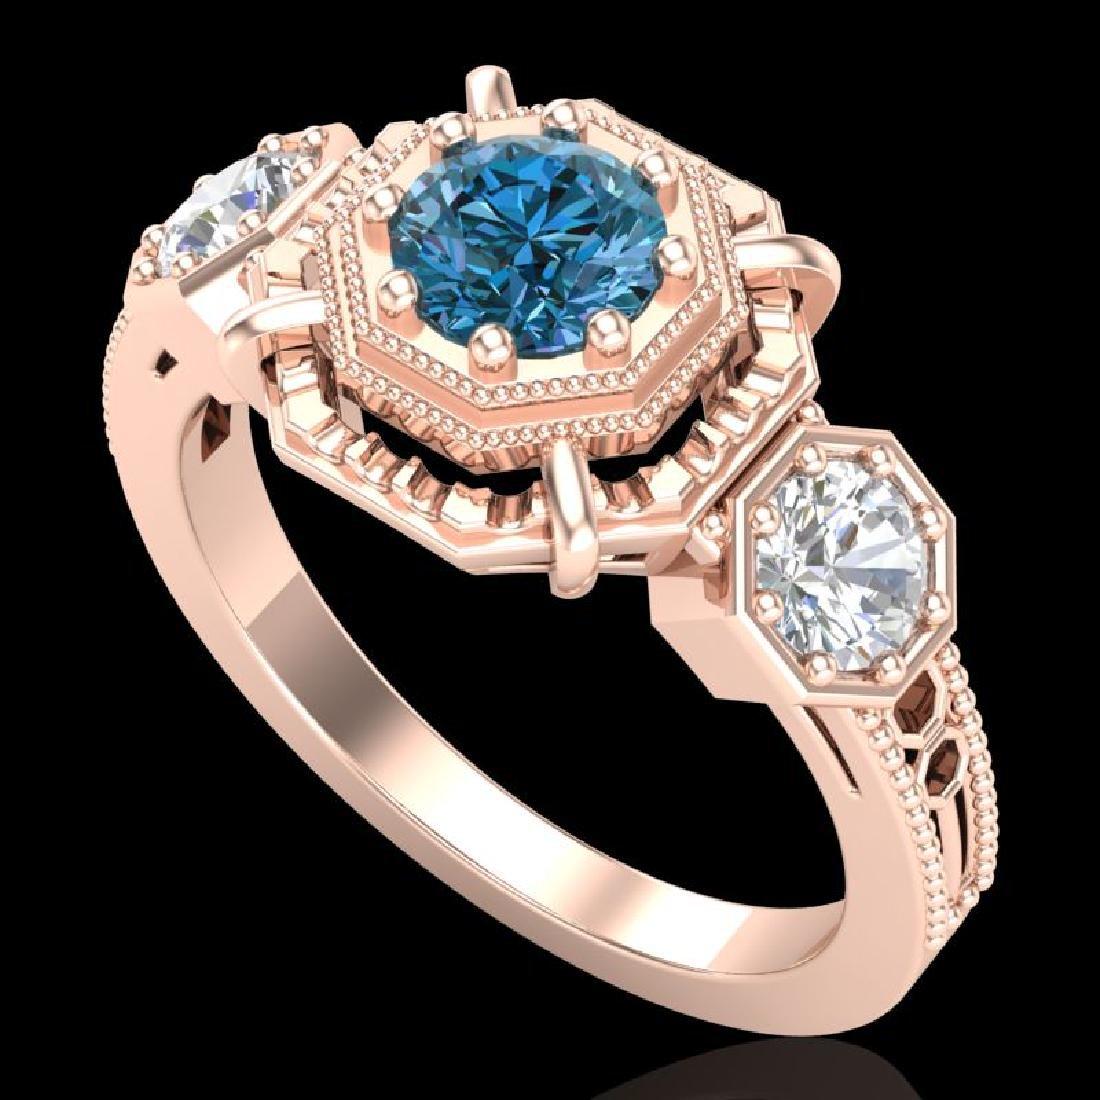 1.01 CTW Fancy Intense Blue Diamond Art Deco 3 Stone